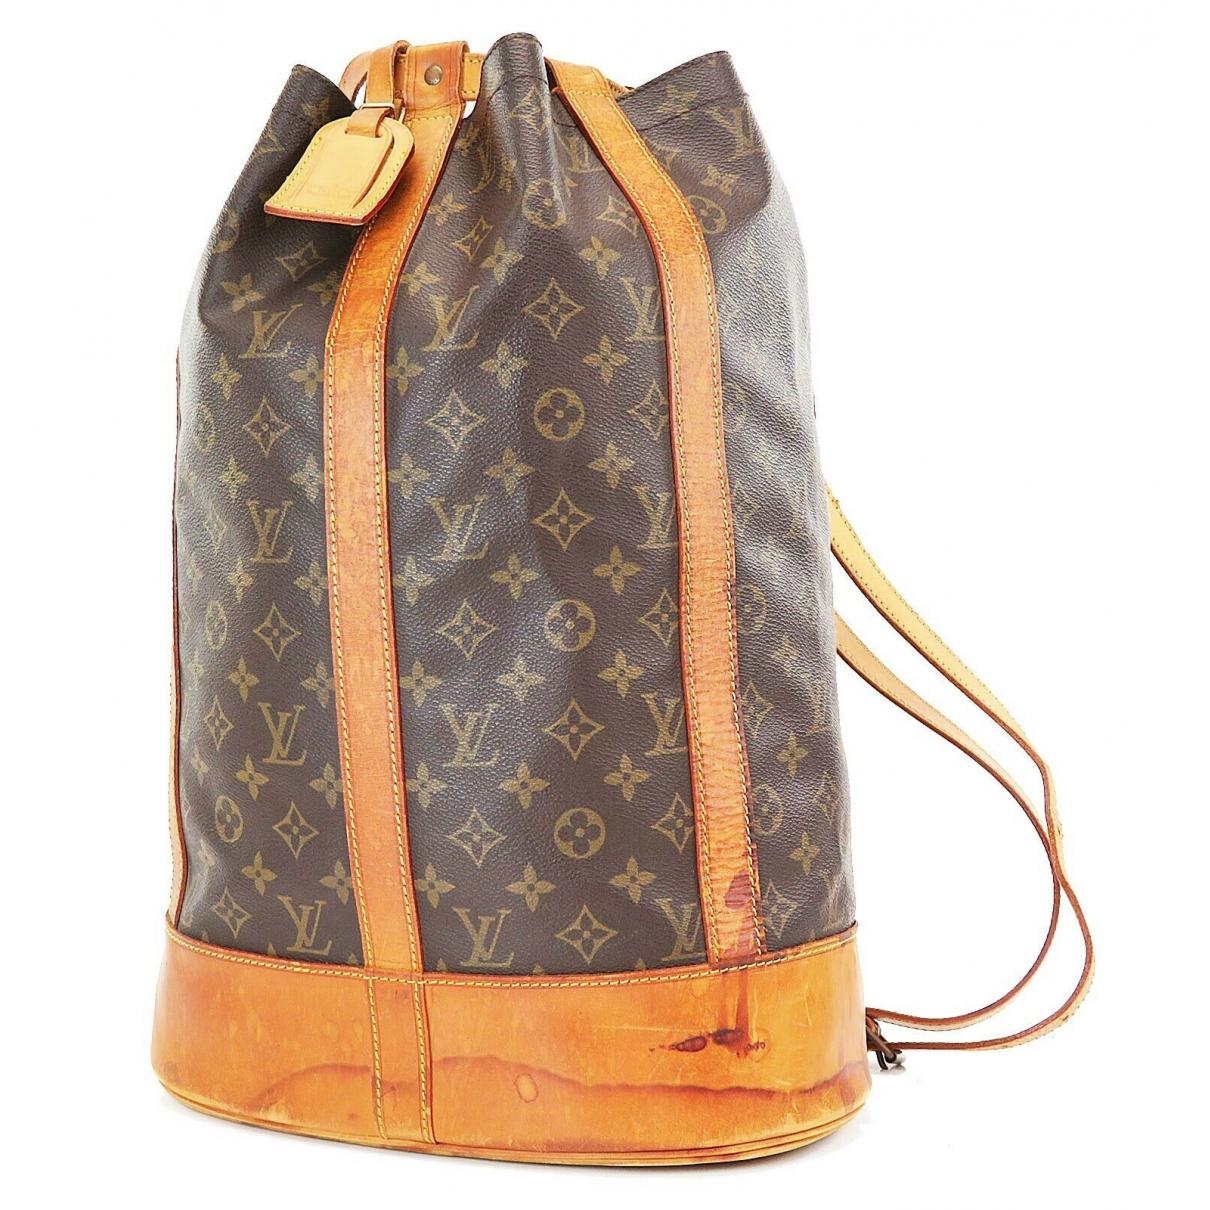 Louis Vuitton - Sac a main Randonnee pour femme en cuir - marron